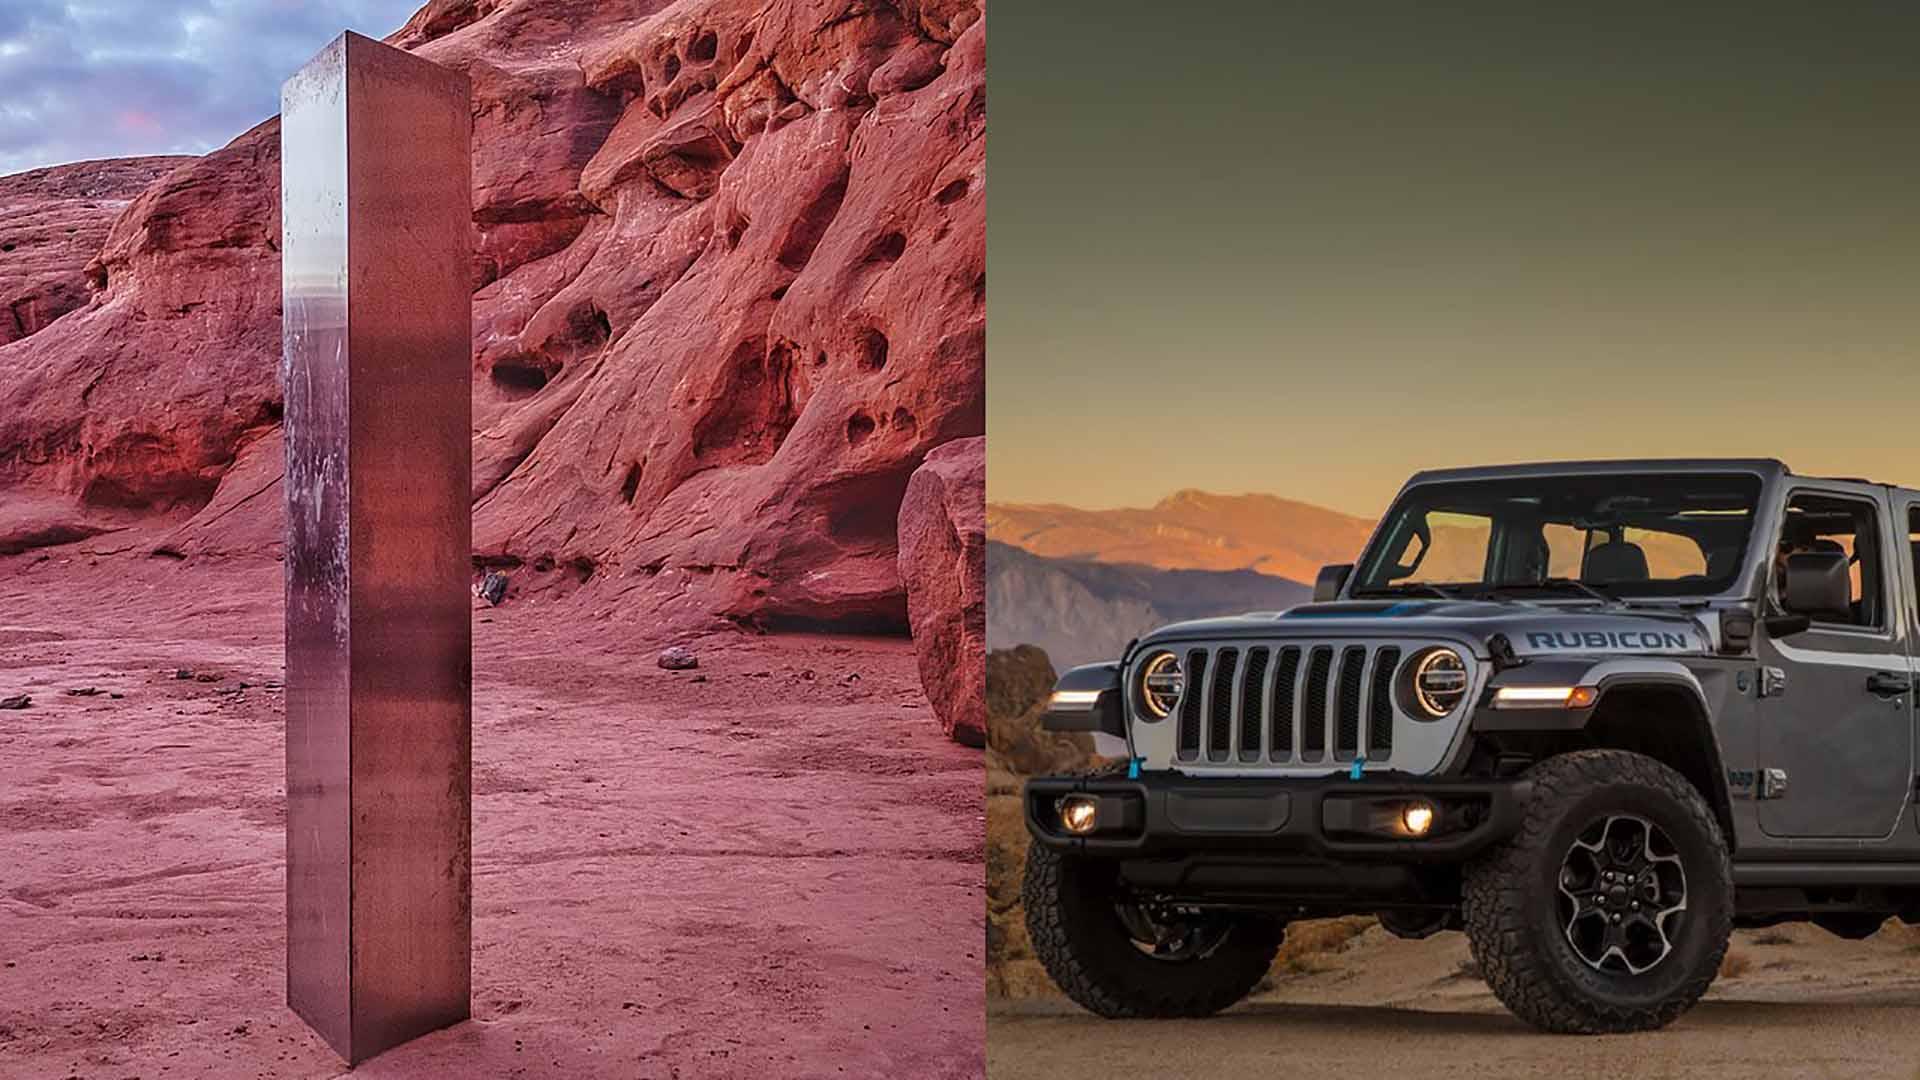 utah-monolith-jeep-wrangler-4xe